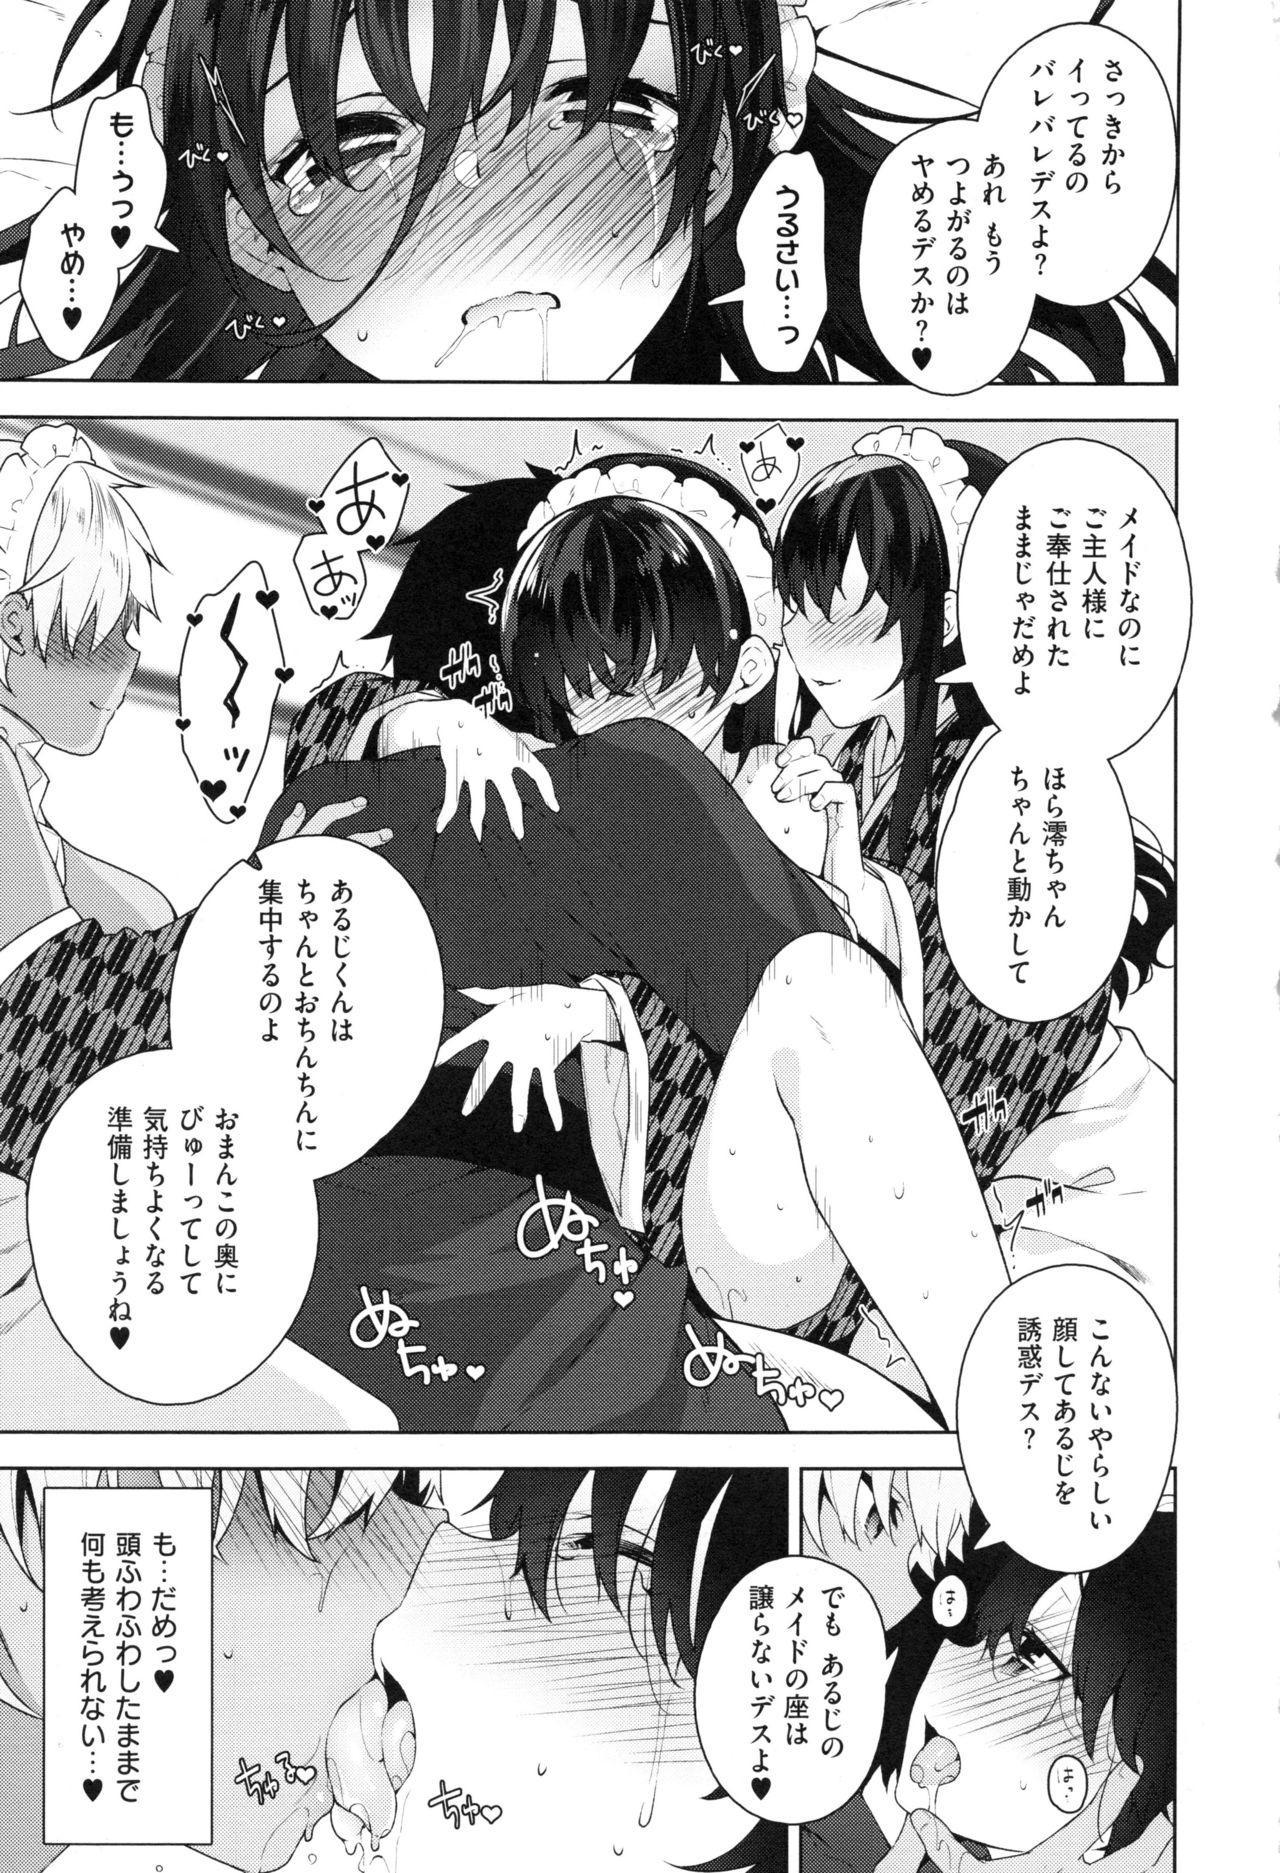 Himitsudere - Secret Love 104